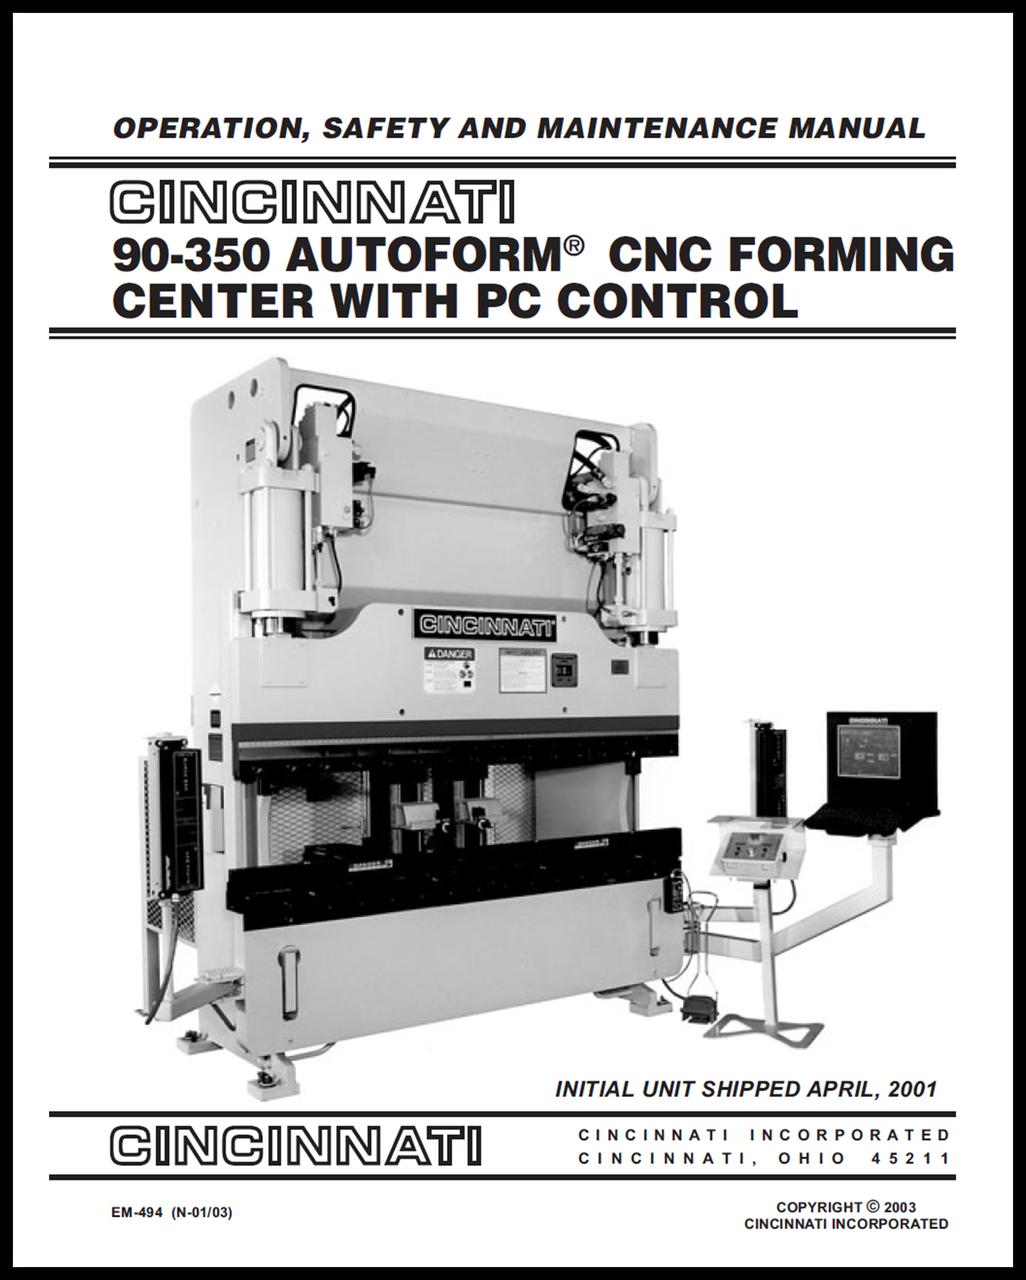 EM-494 (N-01-03) CINCINNATI 90-350 AUTOFORM CNC Forming Center with PC Control